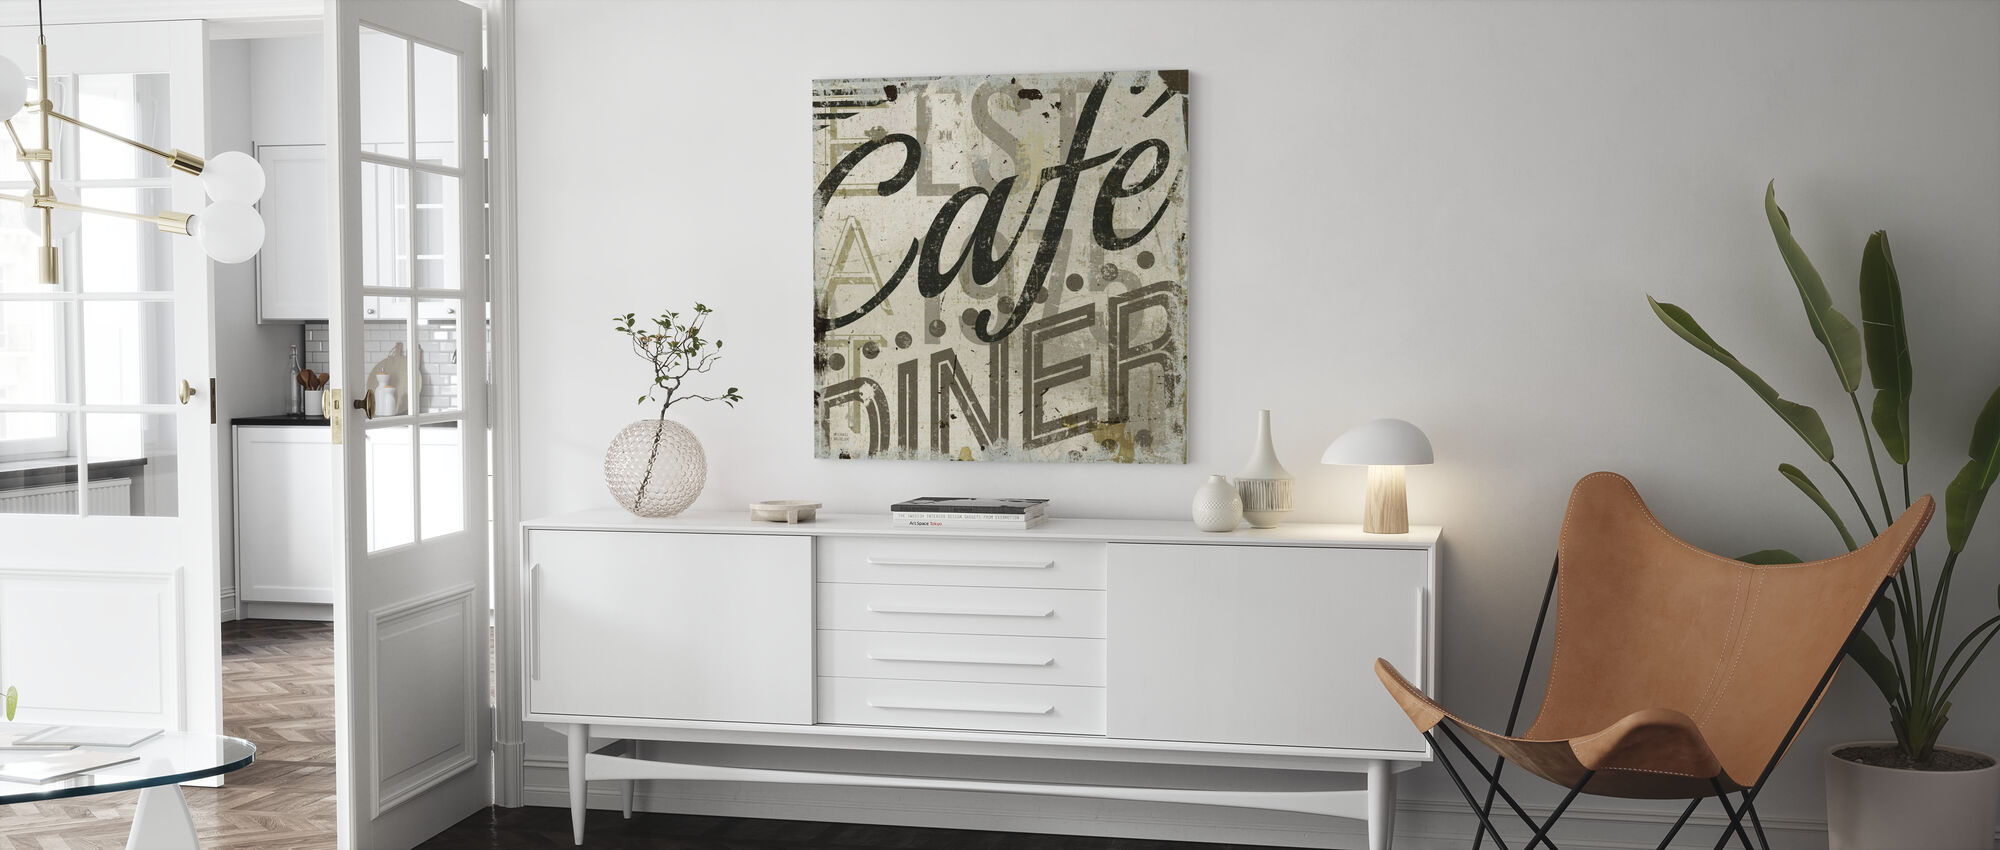 Restaurant Sign II - Canvas print - Living Room